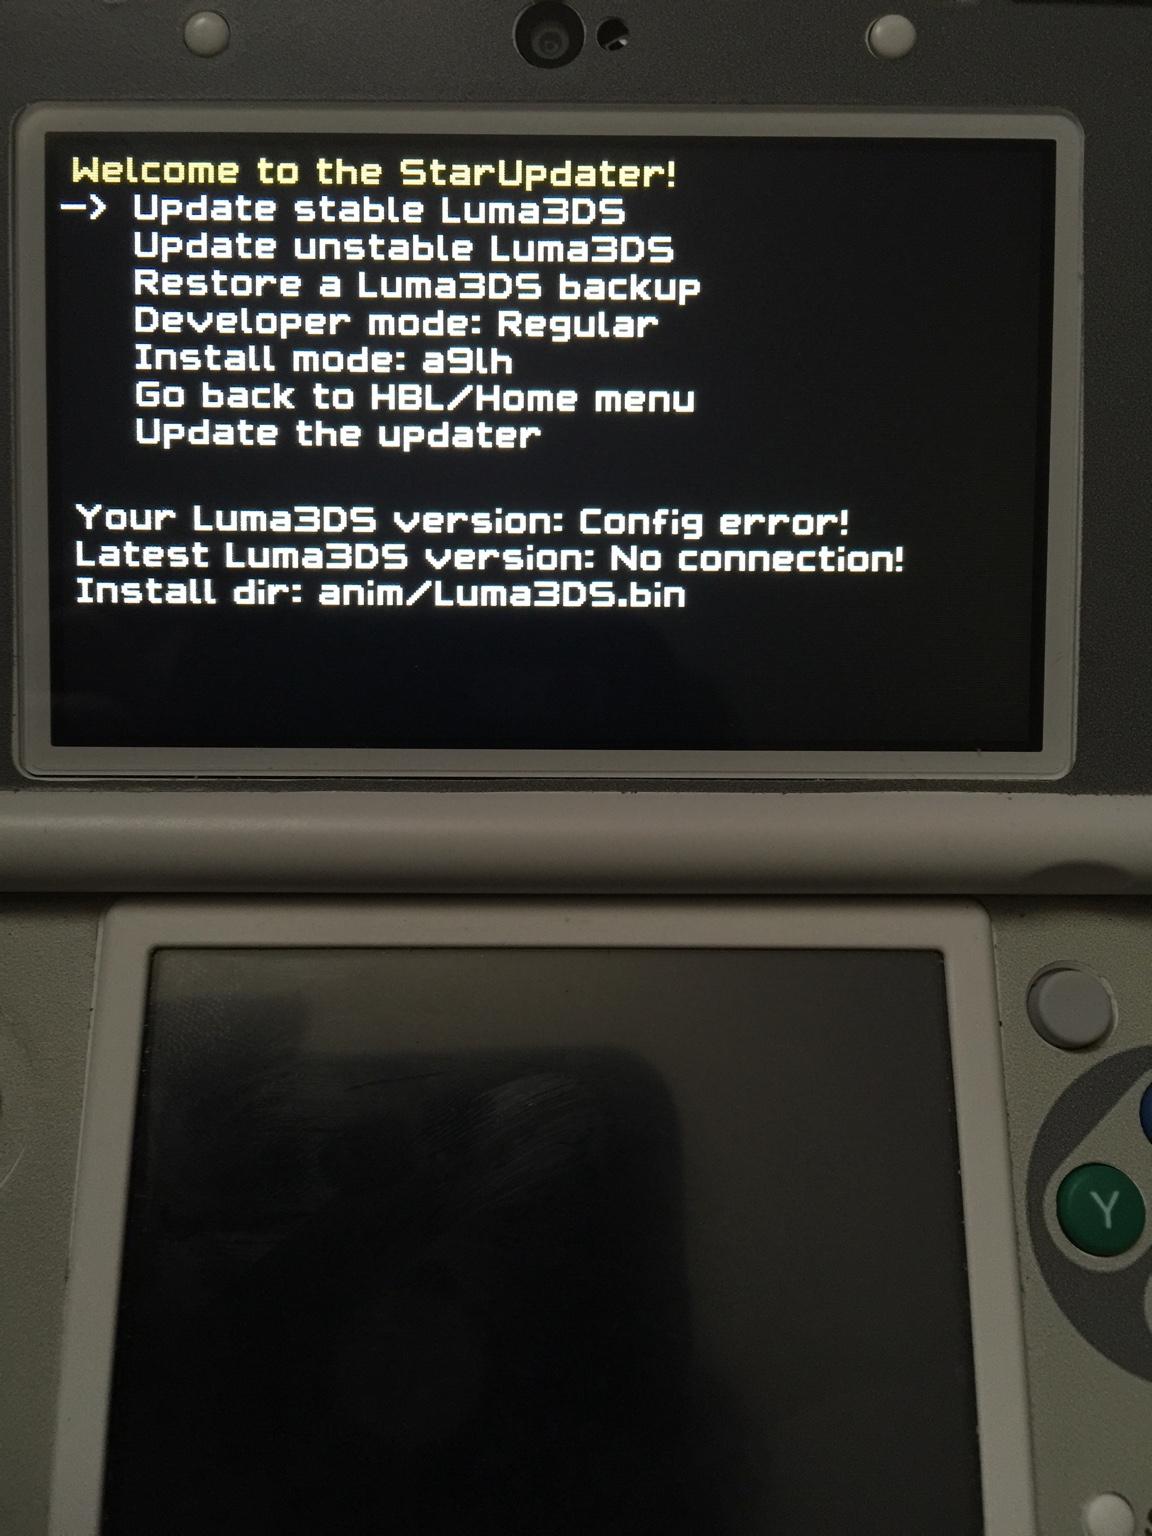 luma3ds_[RELEASE]StarUpdater-ALuma3DSUpdater|Page3|GBAtemp.net-TheIndependent